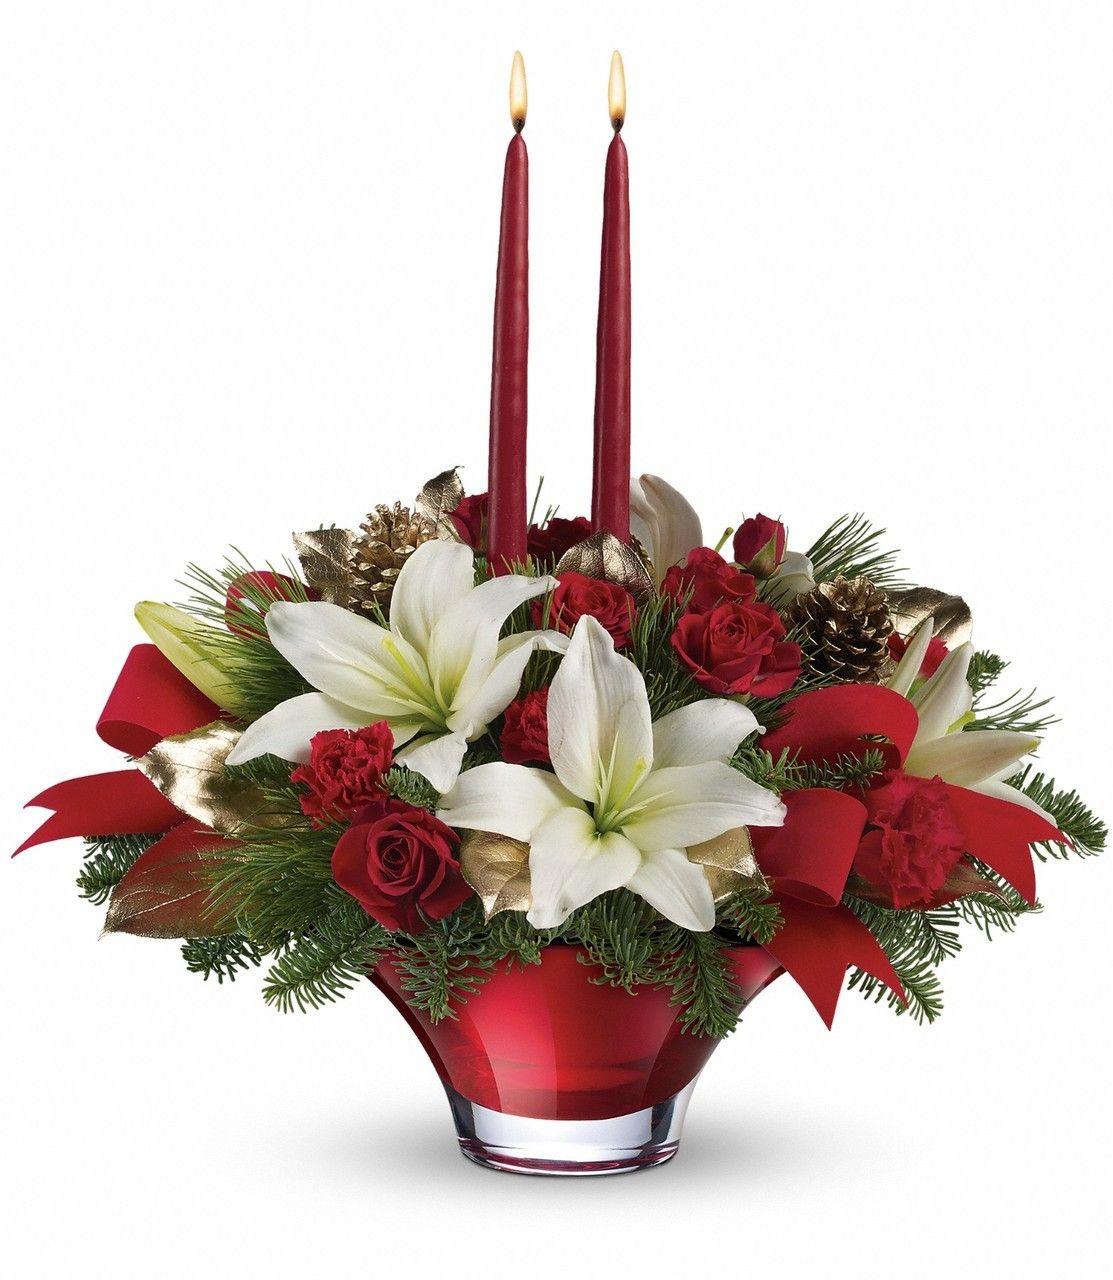 2020 Teleflora Christmas Containers Teleflora Crimson Glow Centerpiece | Christmas flower arrangements